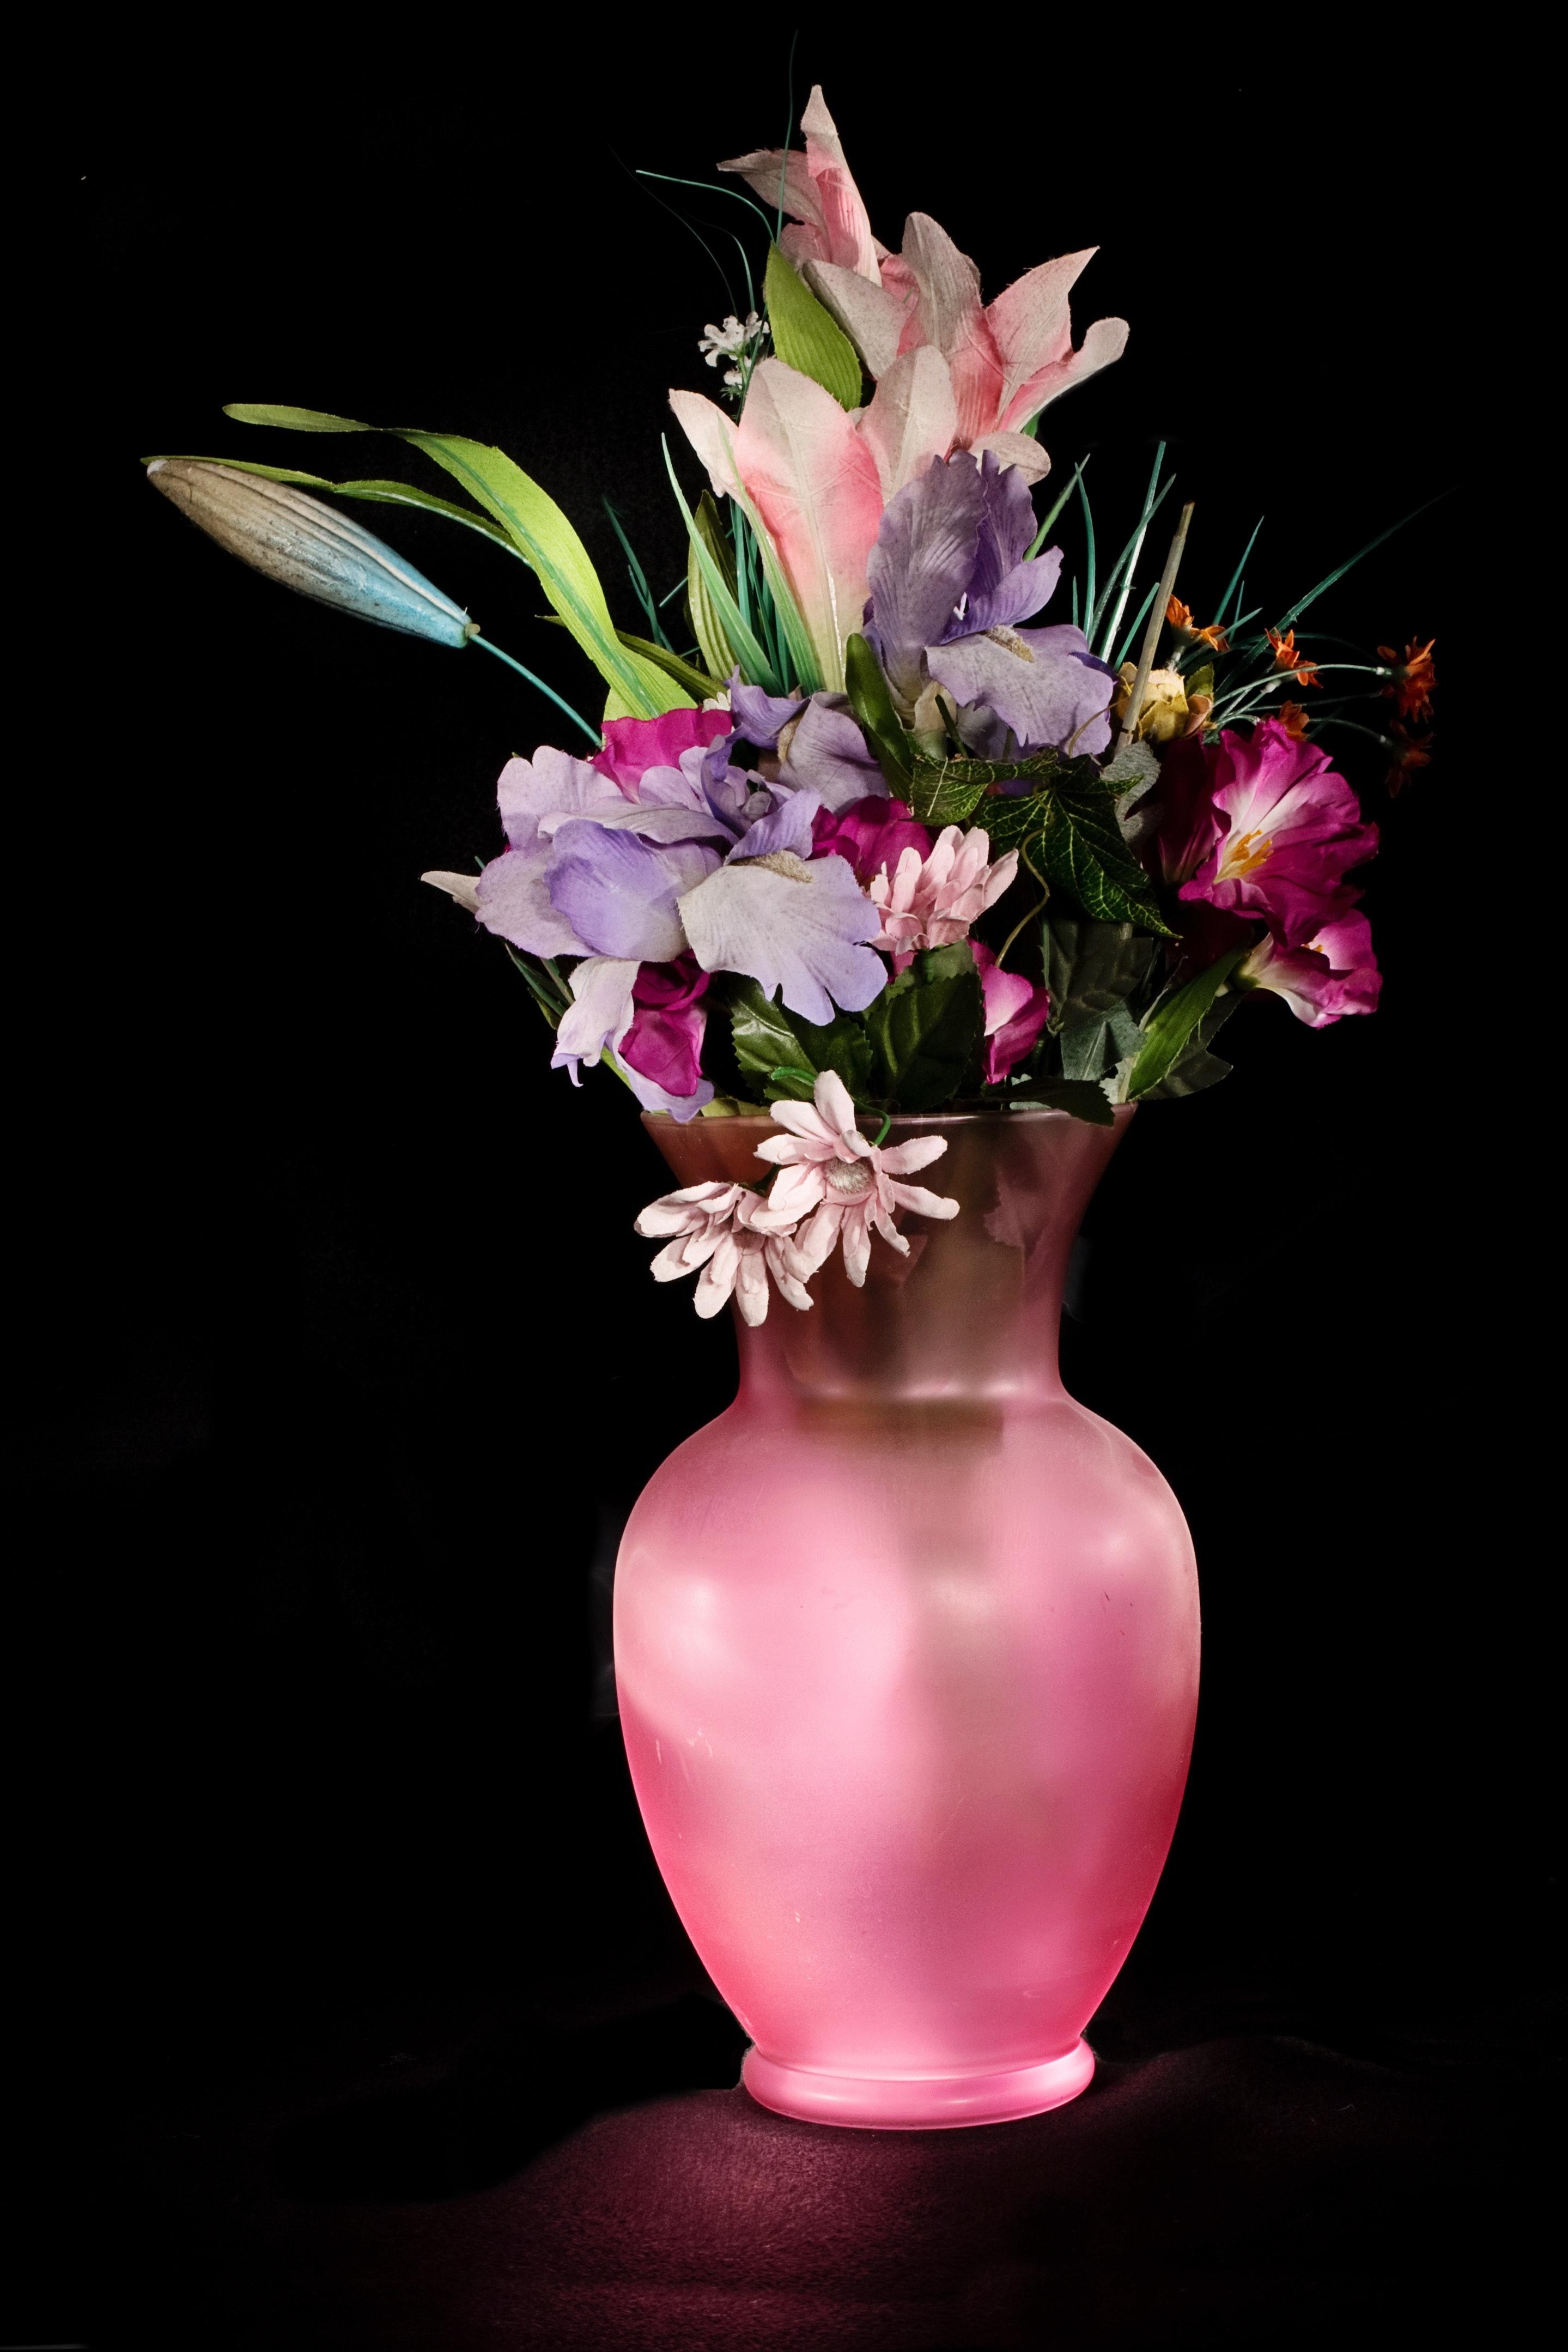 Free stock photos of flower vase pexels flower vase photos reviewsmspy